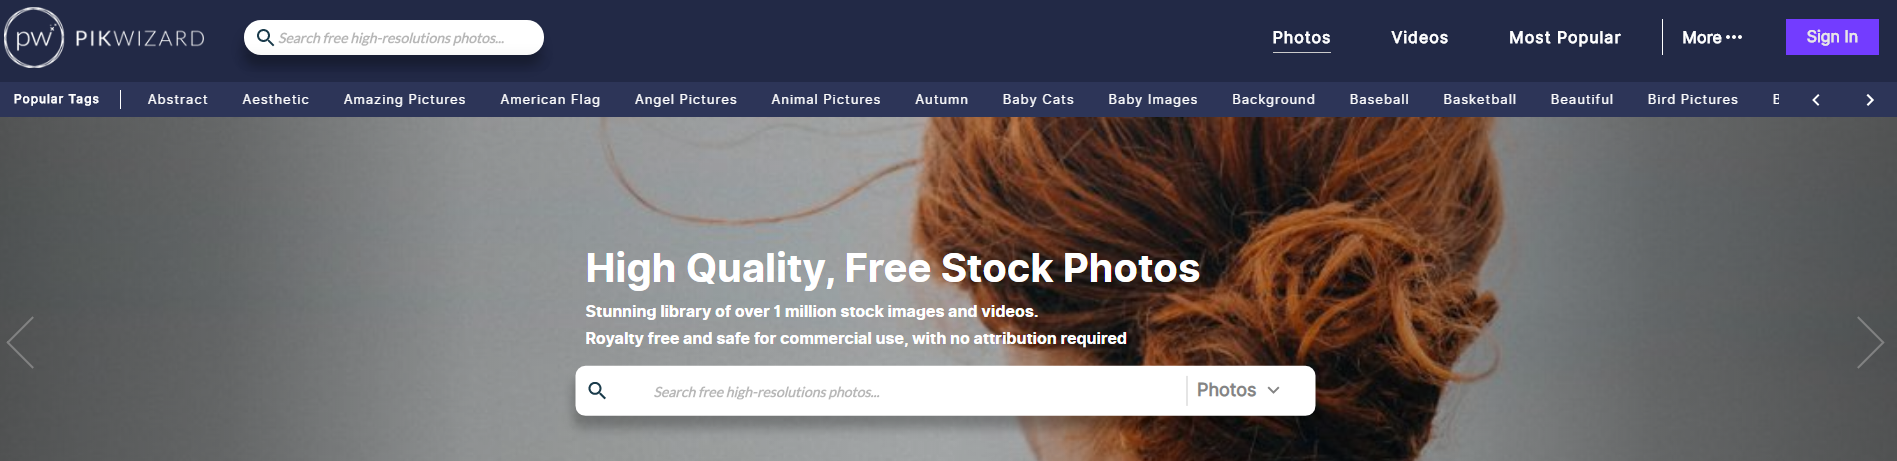 Free Stock Photos Pikwizard